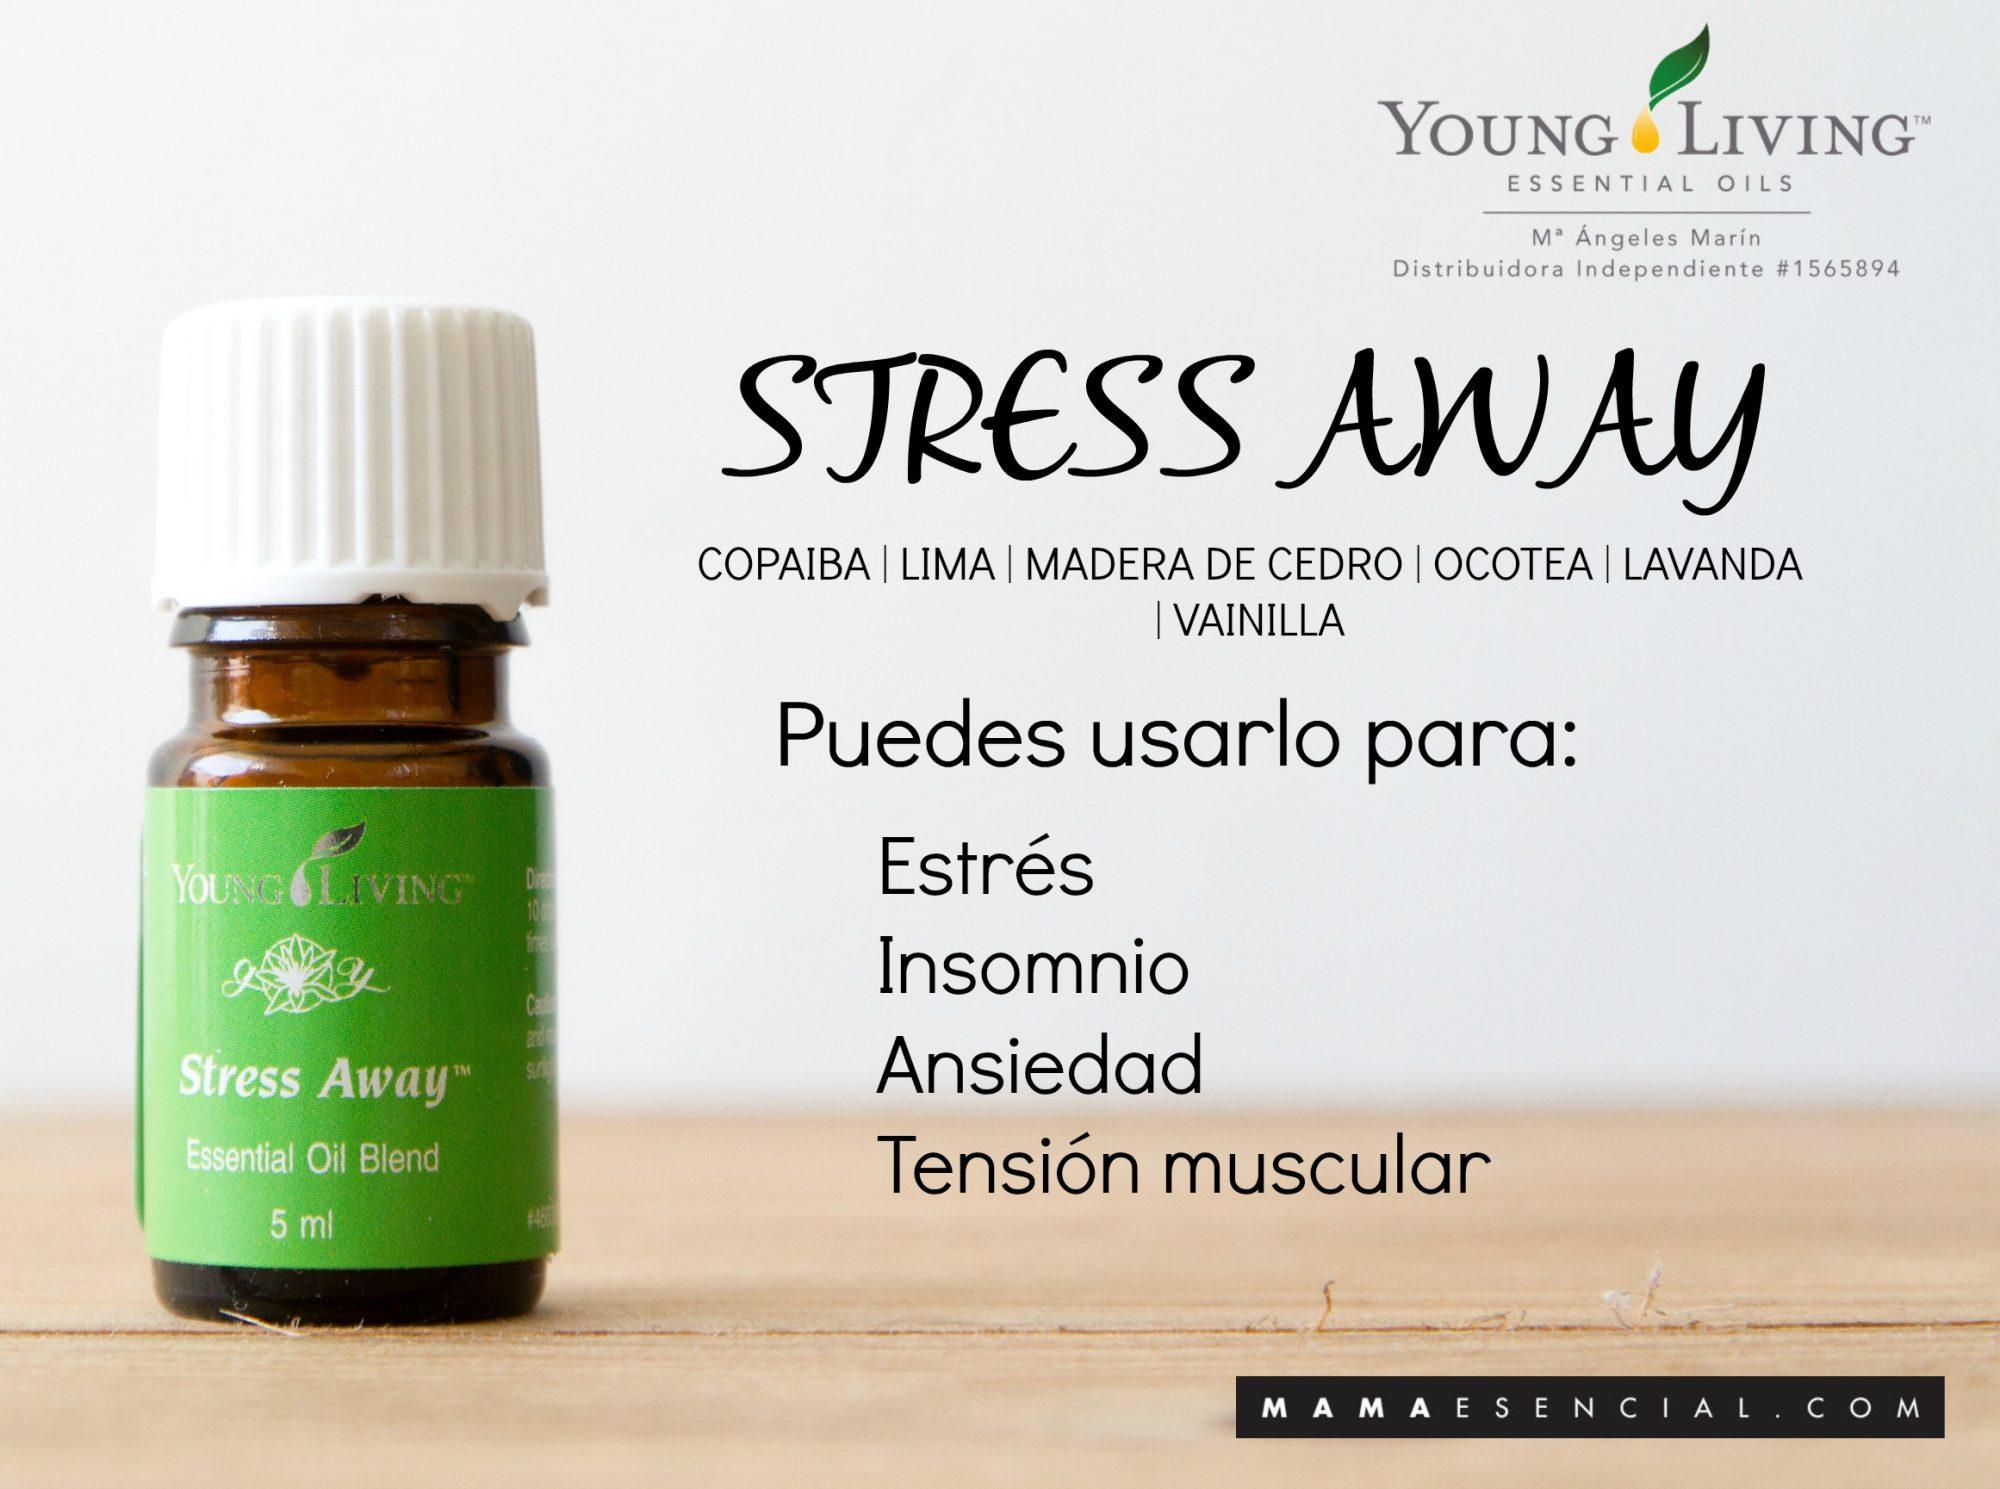 MEZCLA DE ACEITES ESENCIALES STRESS AWAY